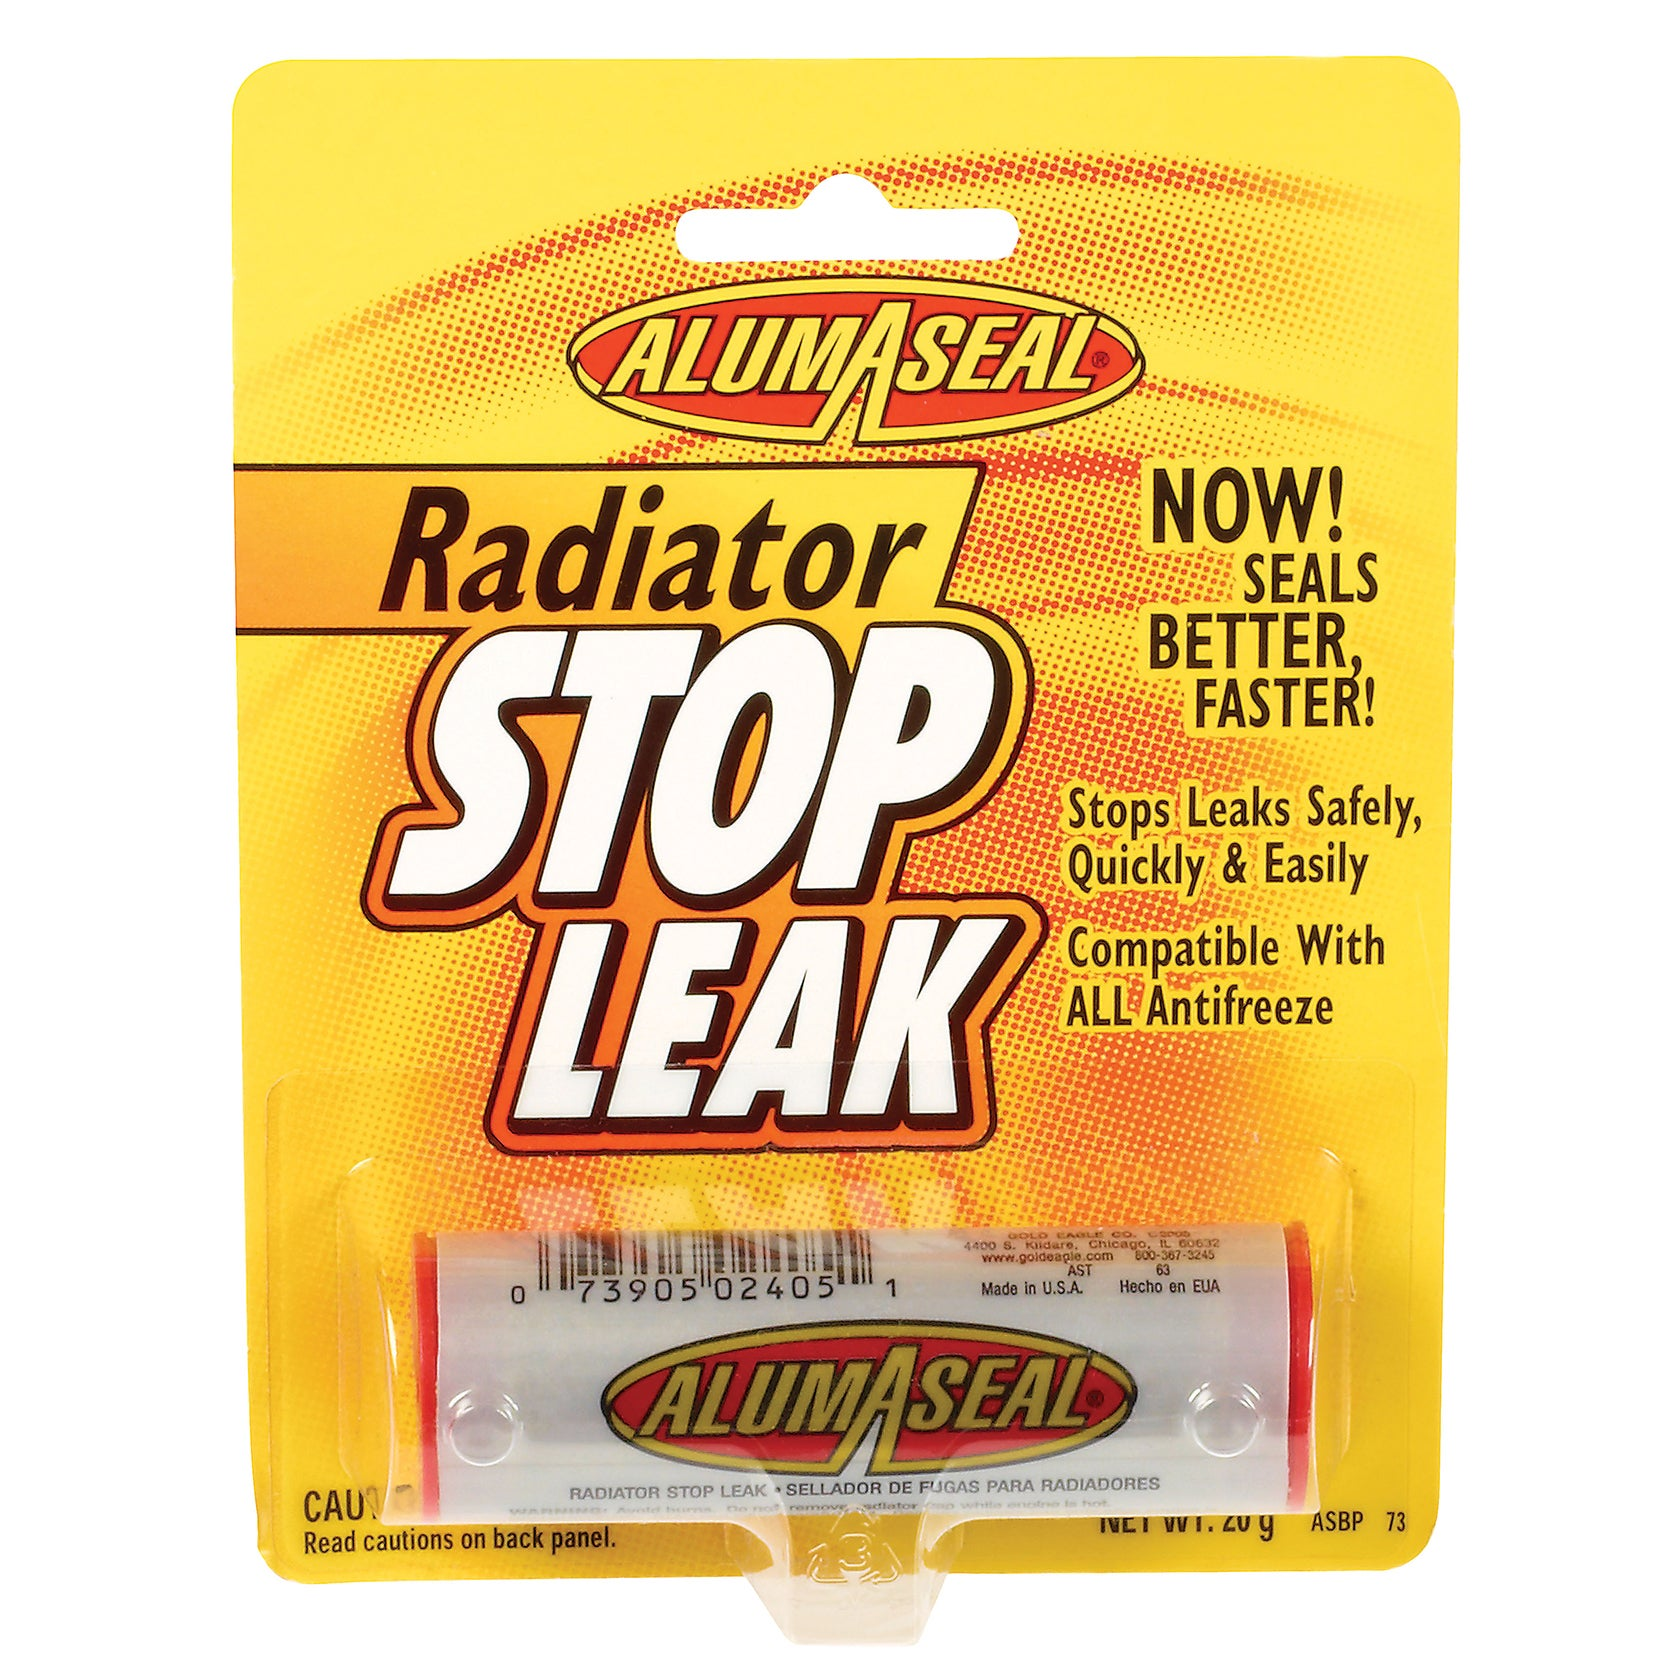 Alumaseal ASBPI12 1 Oz Radiator Sealer (Car care/cleaning...